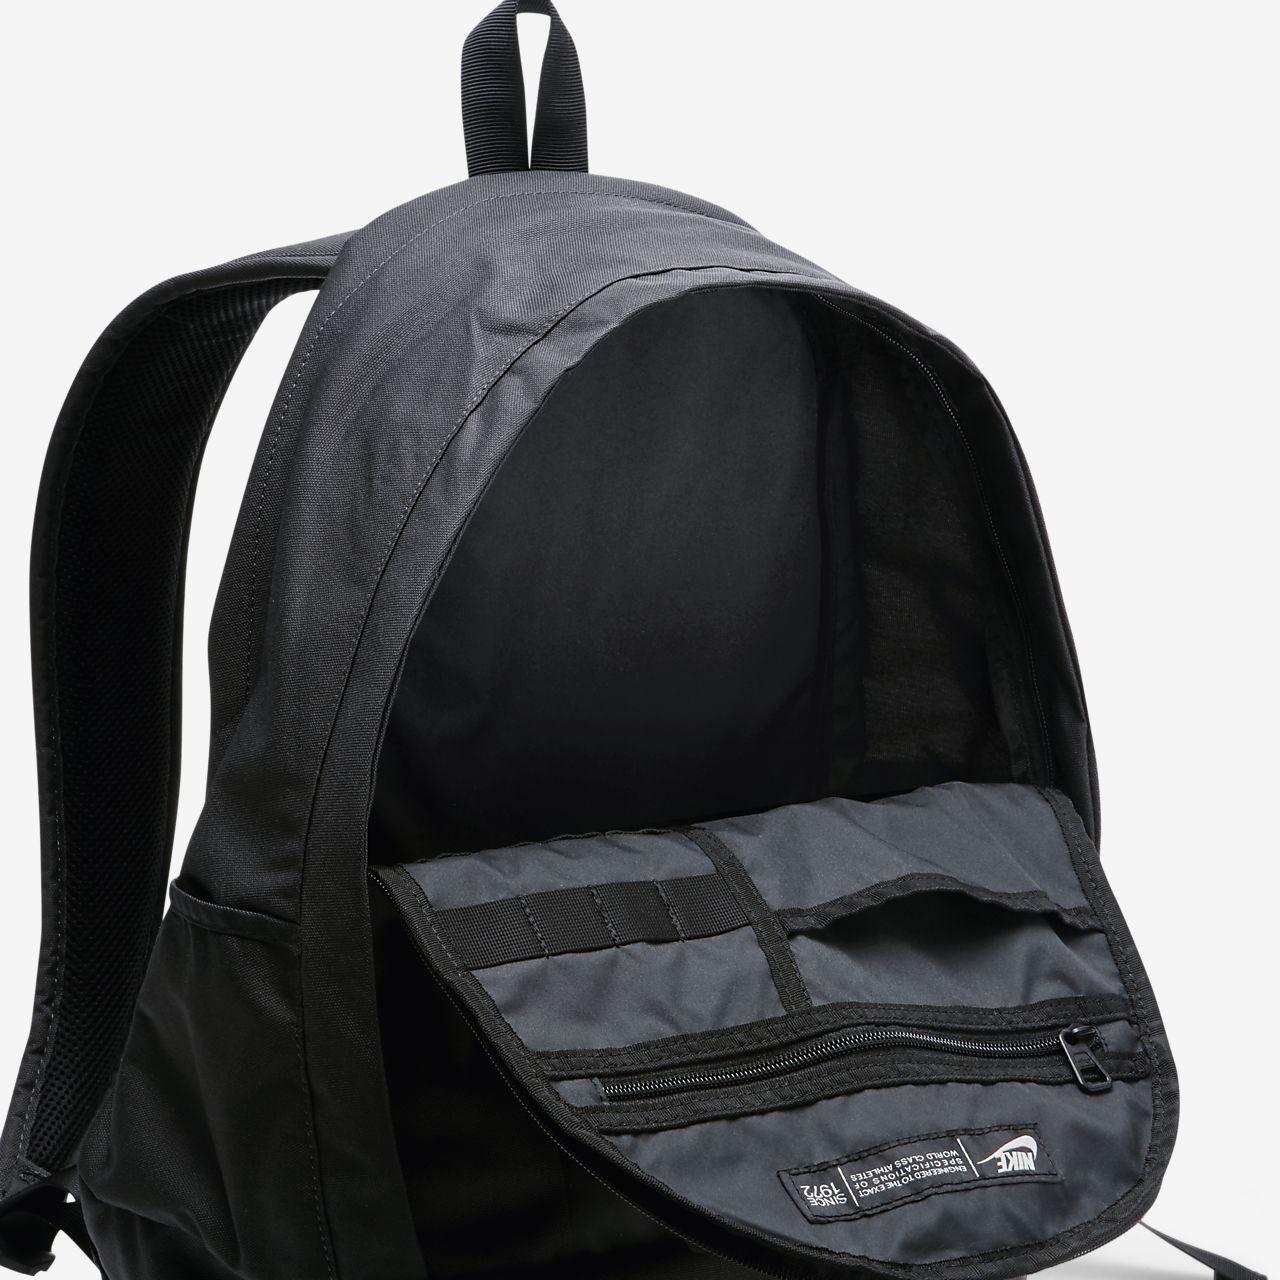 7c9f6a7964ab Nike Sportswear Cheyenne 3.0 Solid Backpack. Nike.com CH